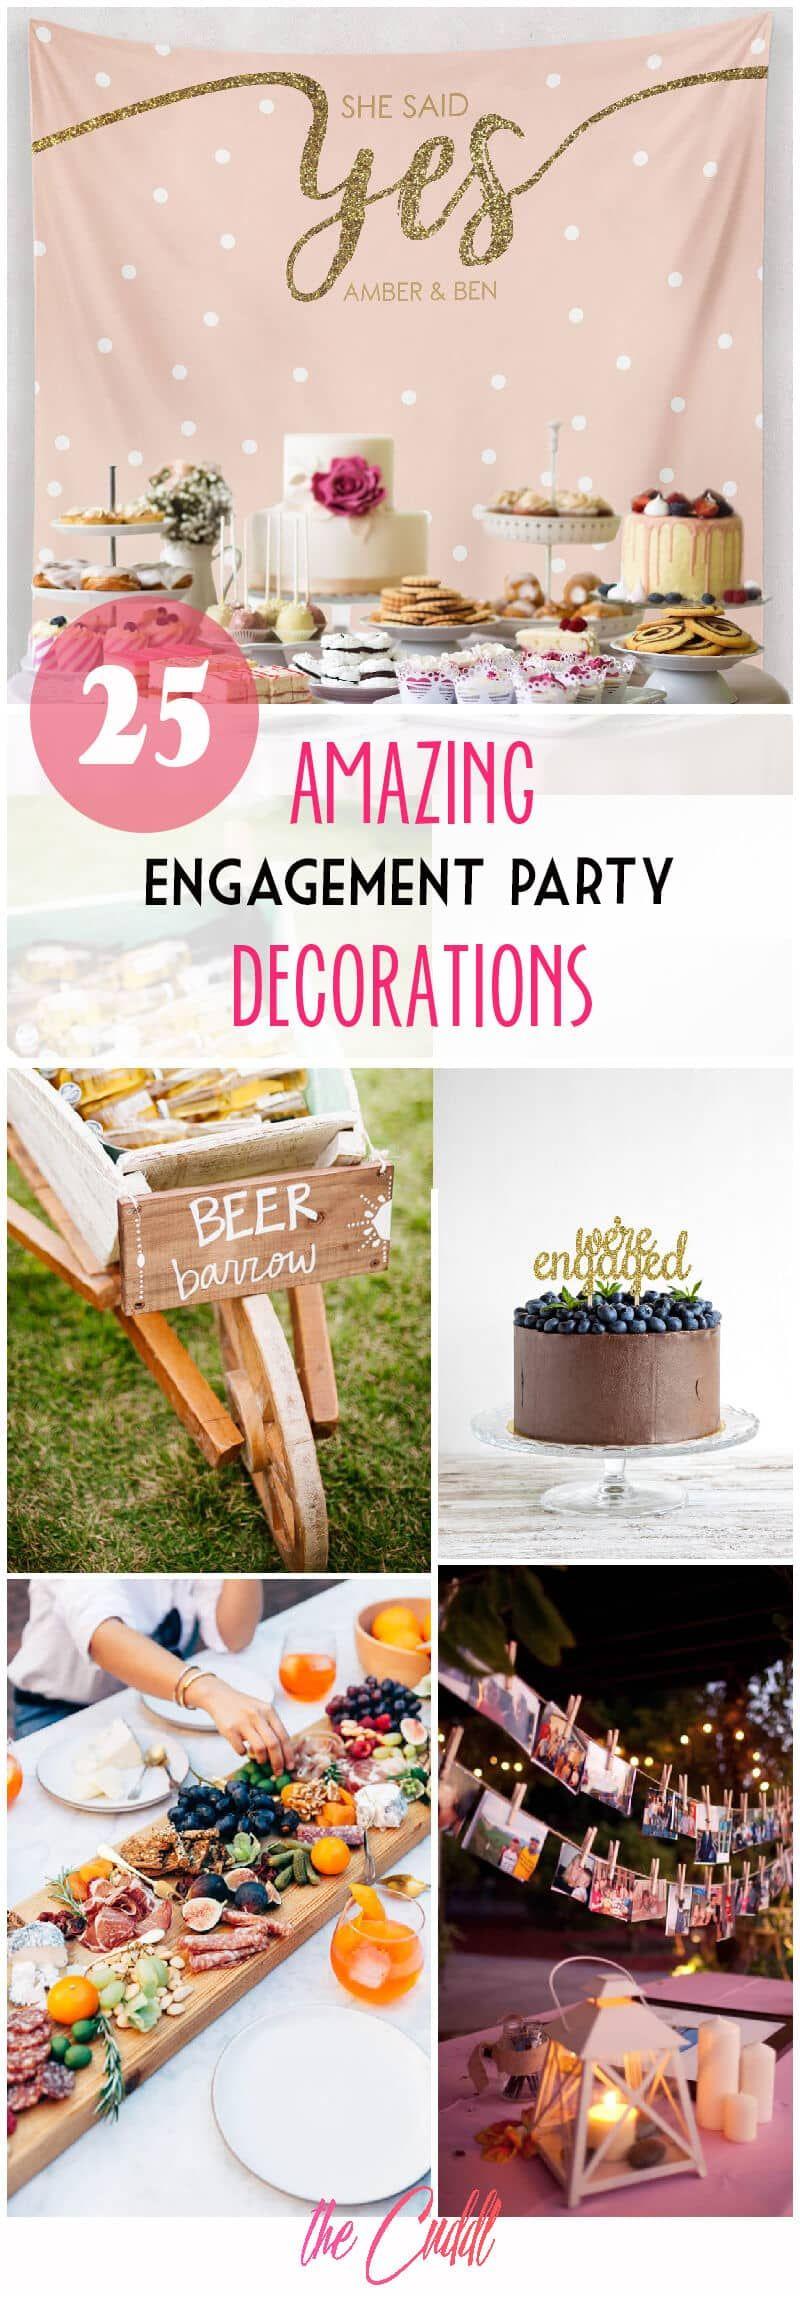 25 Amazing DIY Engagement Party Decoration Ideas for 2019 #engagementpartyideasdecorations